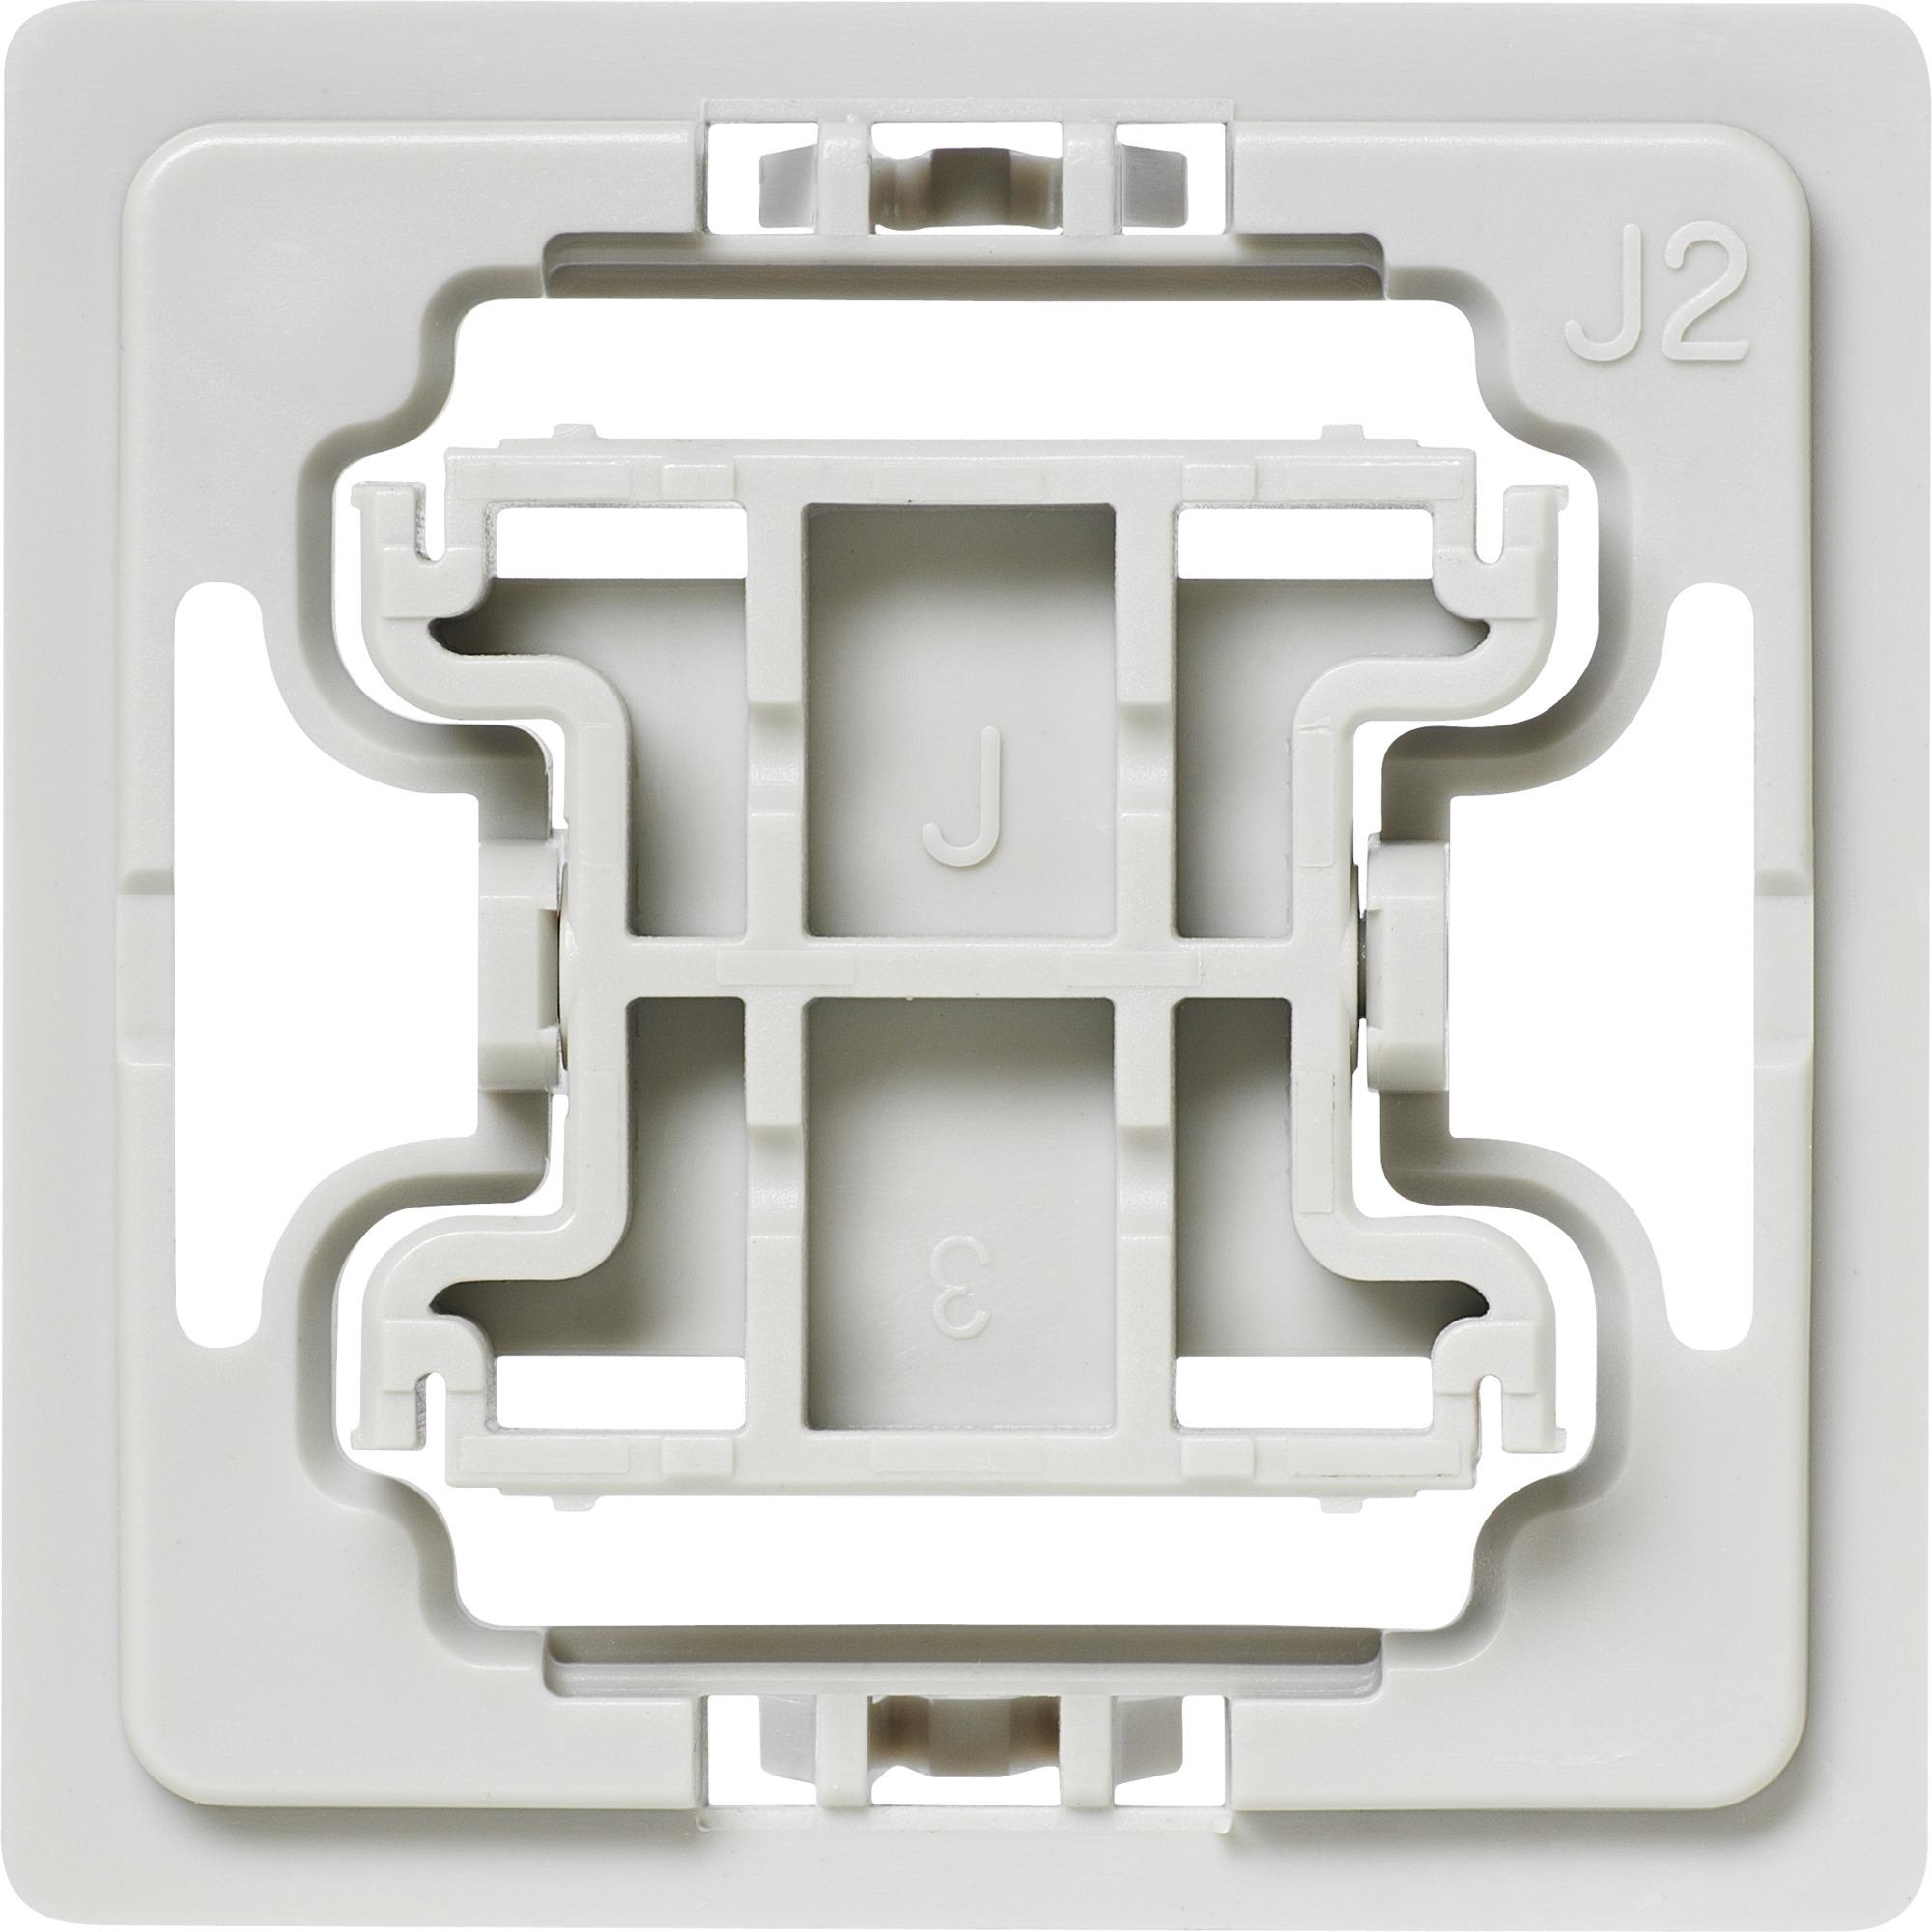 EQ3-ADA-J2 Atenuador e interruptor Integrado Blanco, Adaptador